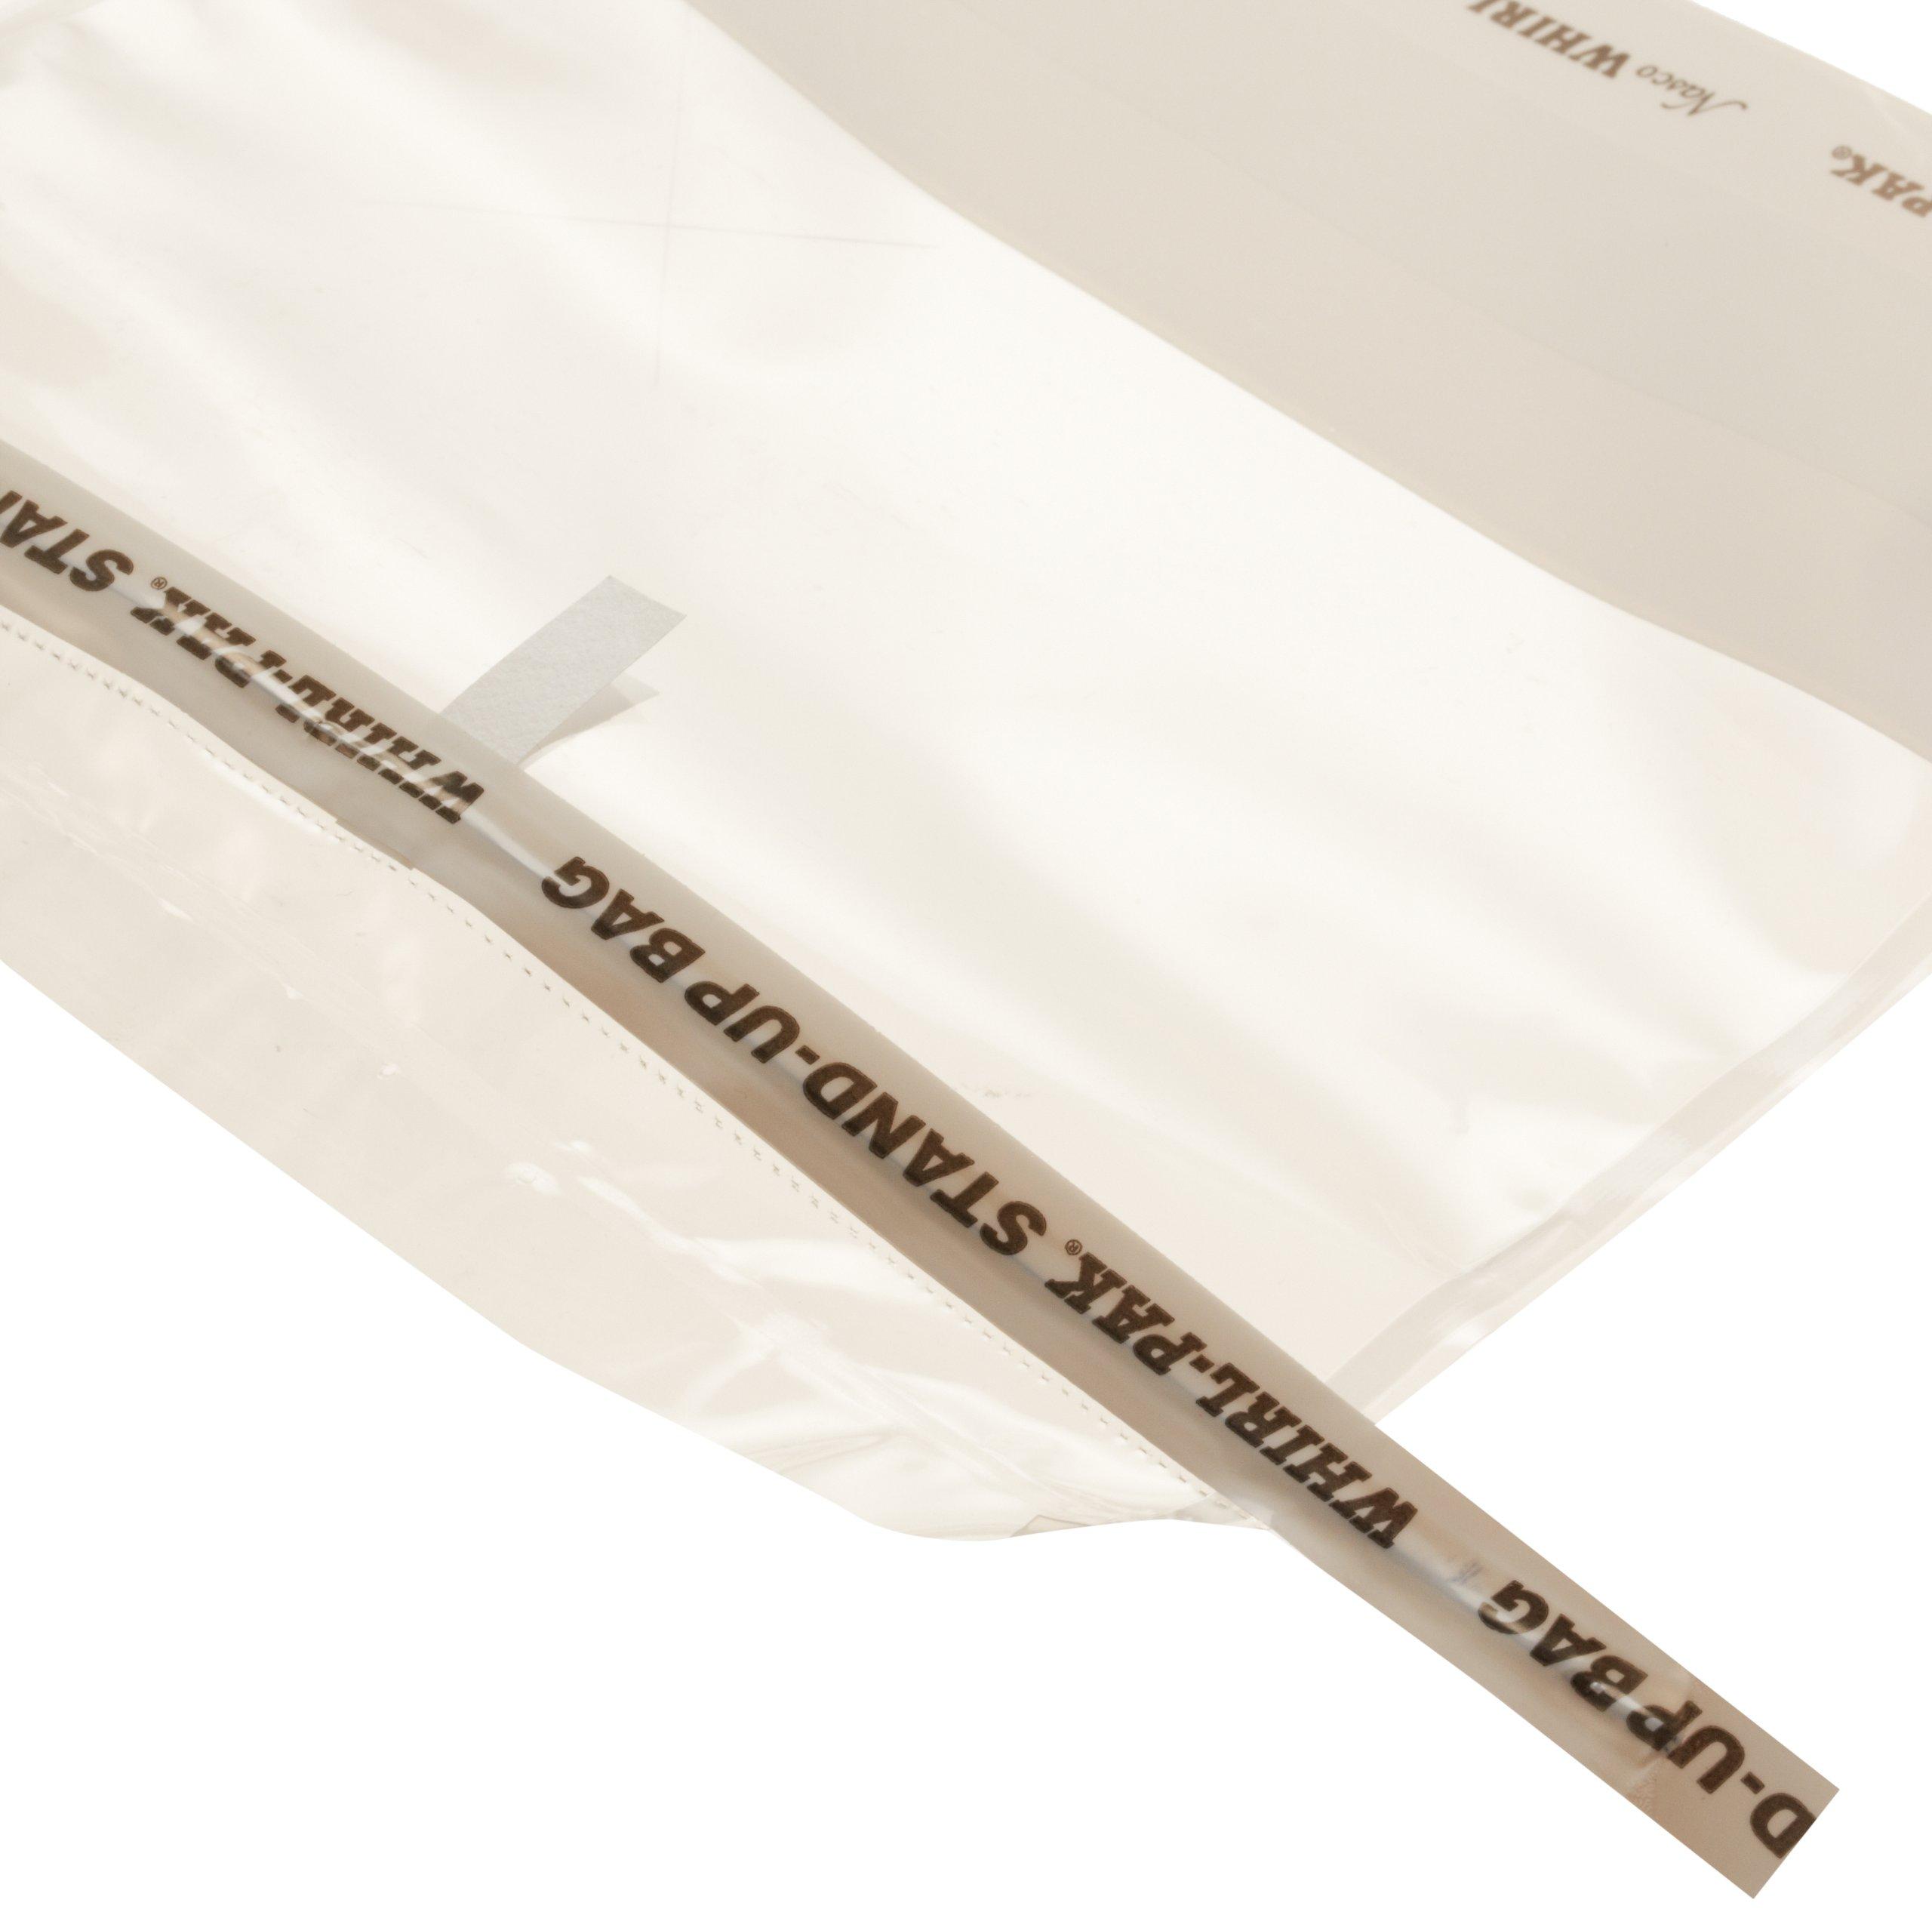 Nasco Whirl-Pak B01401WA Stand-Up Bag, 23cm L x 15cm W, 710ml Capacity (Box of 500)